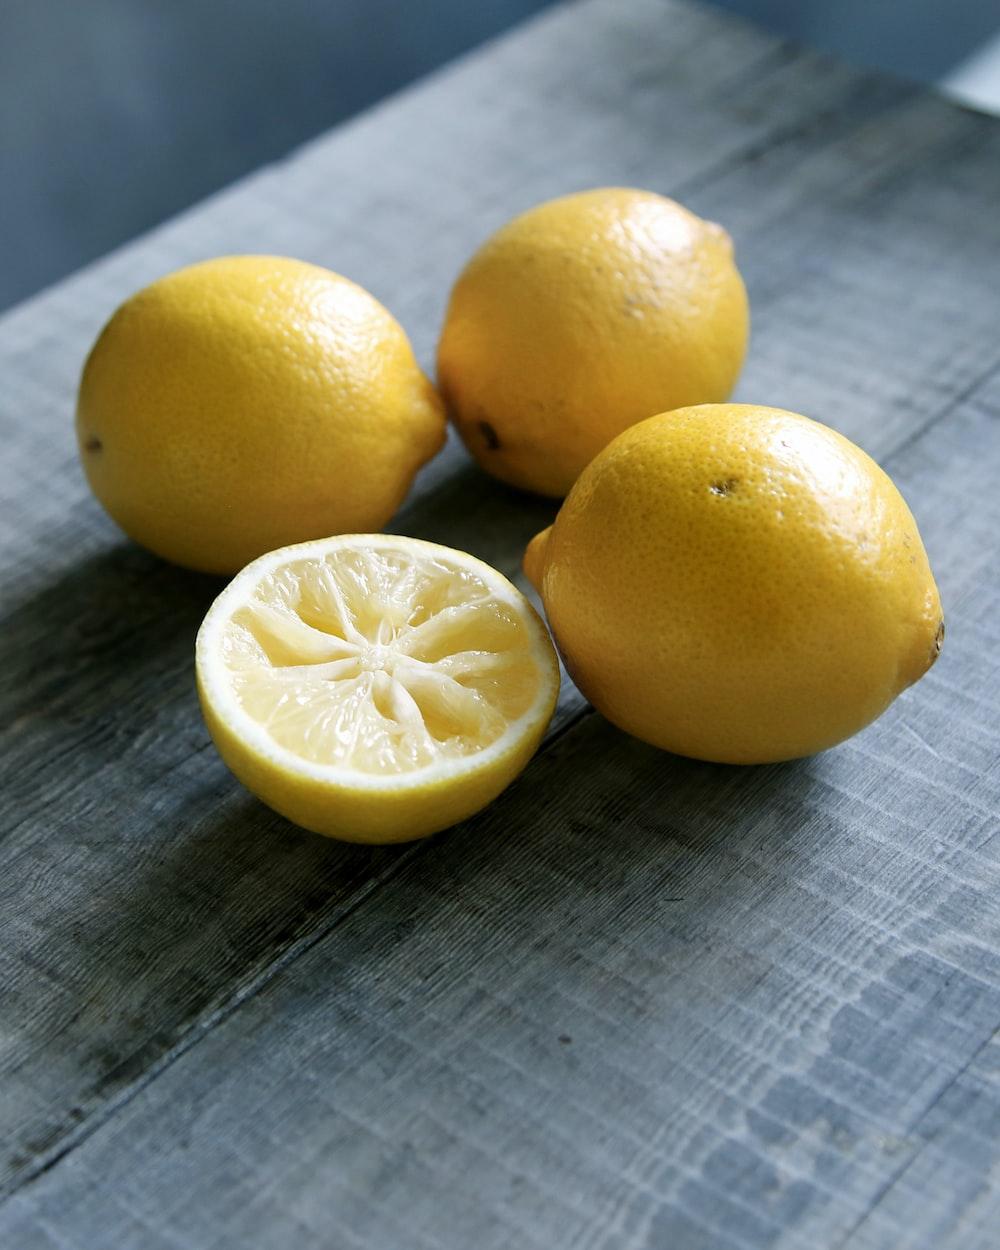 three yellow lemons beside sliced lemon placed on gray wooden surface